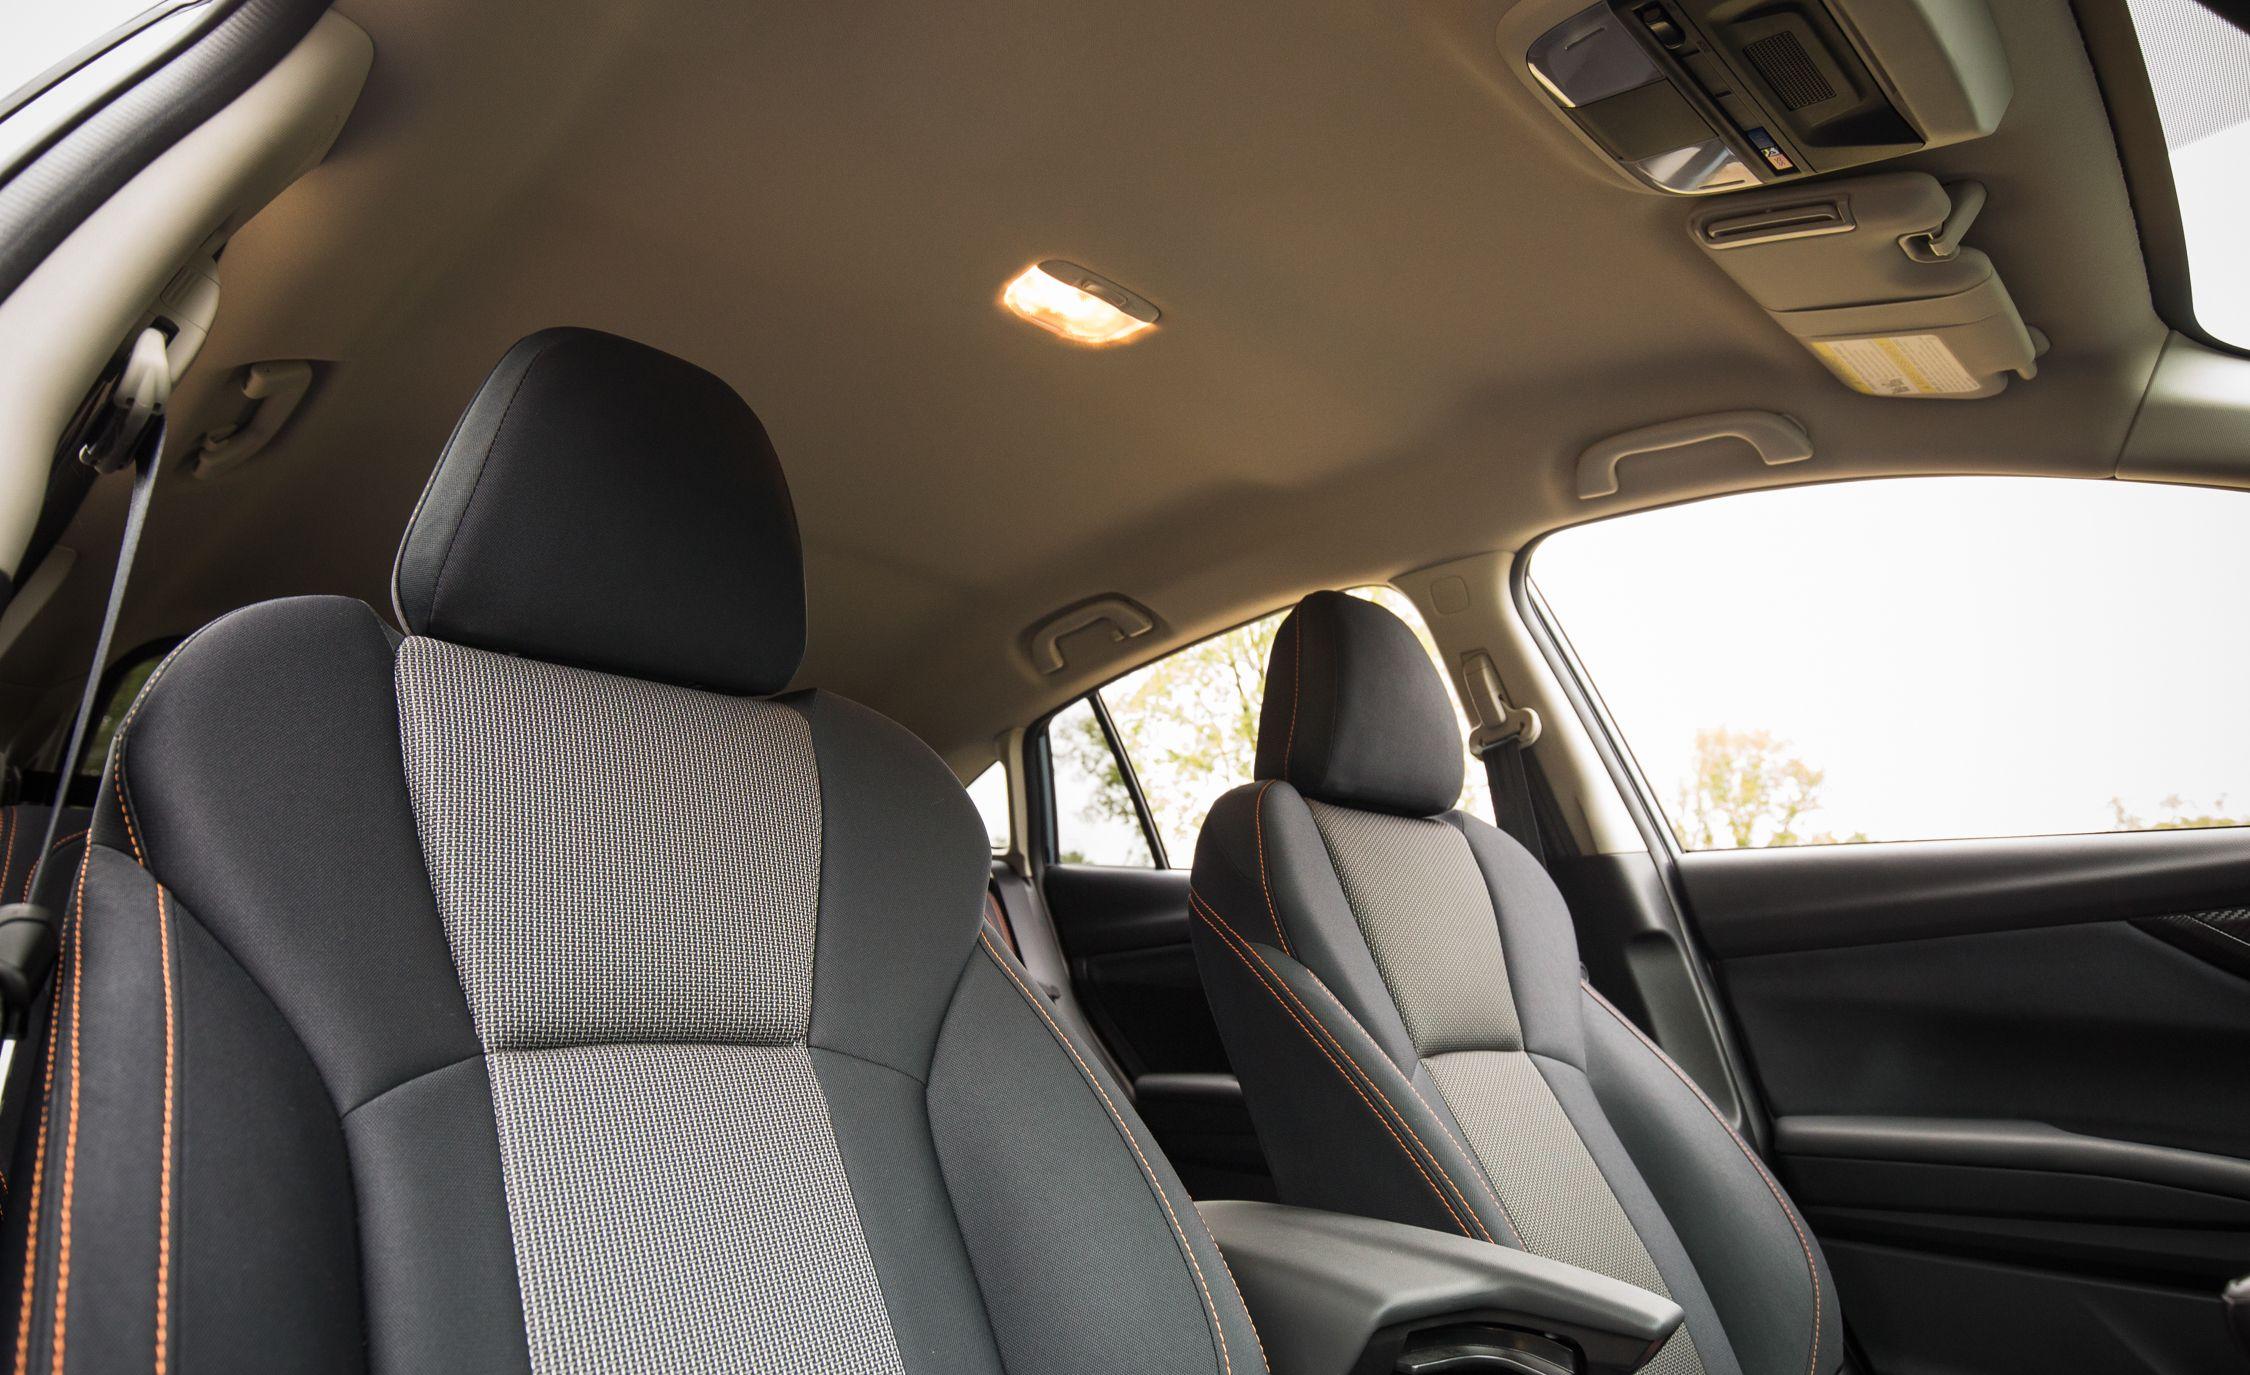 2019 Subaru Crosstrek Reviews Subaru Crosstrek Price Photos And